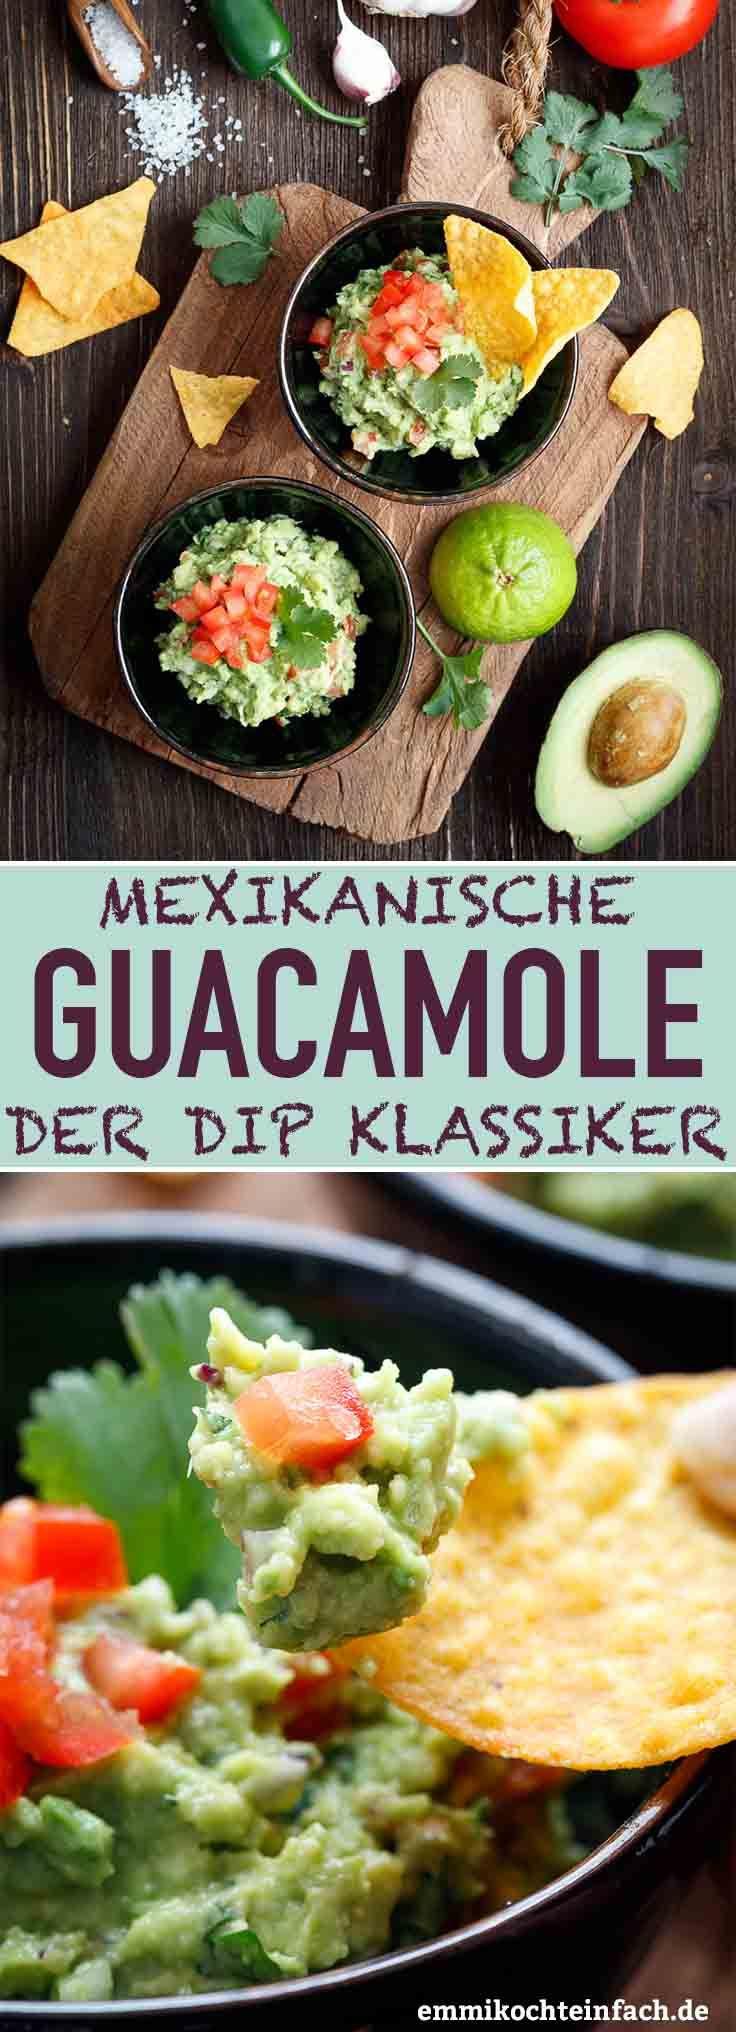 Mexikanische Guacamole – Der einfache Dip-Klassiker